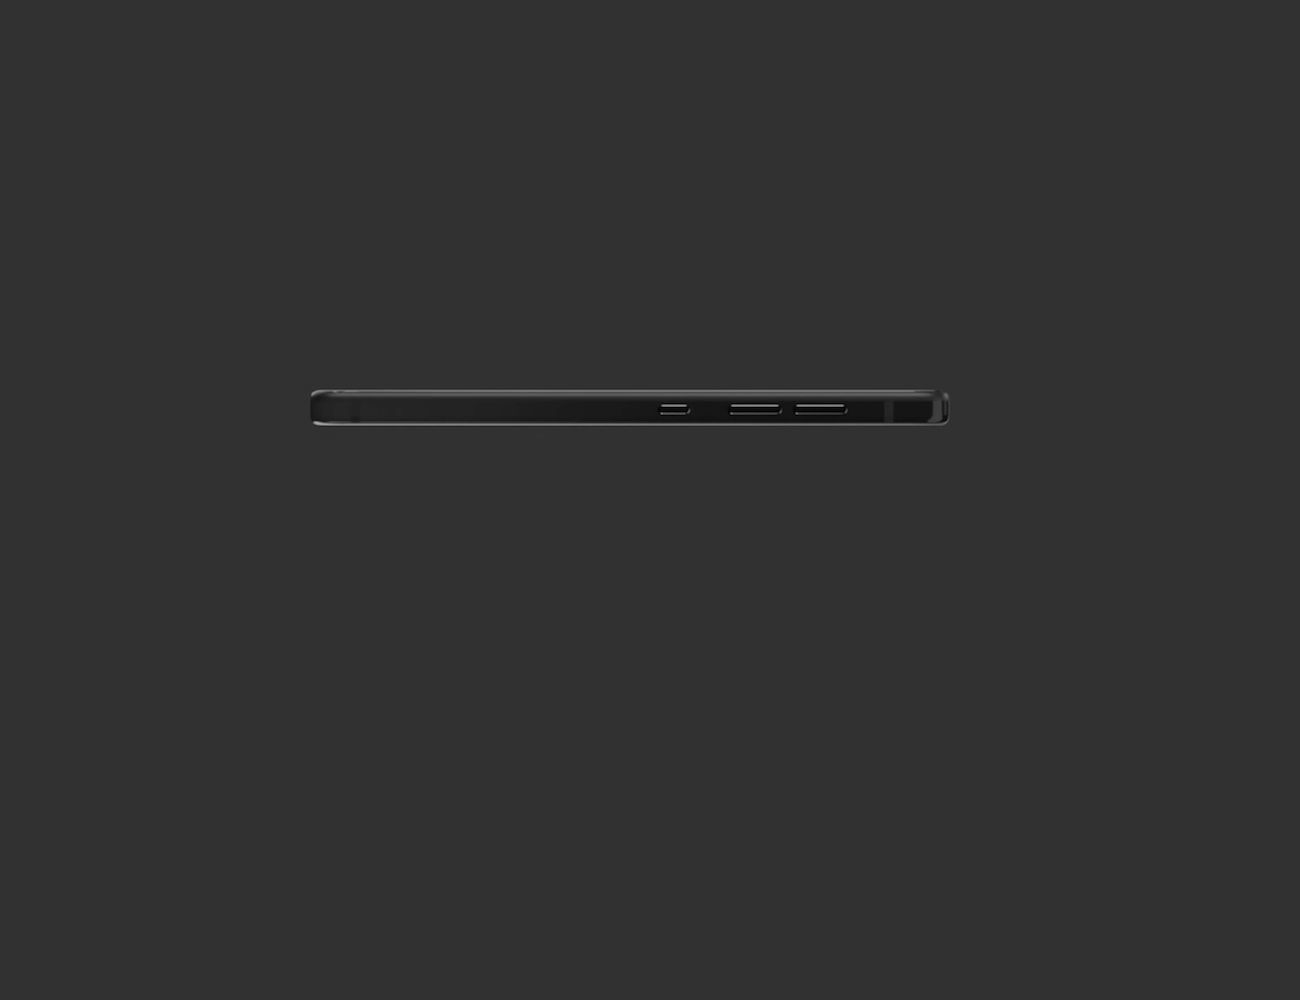 Essential Modular Sleek Smartphone